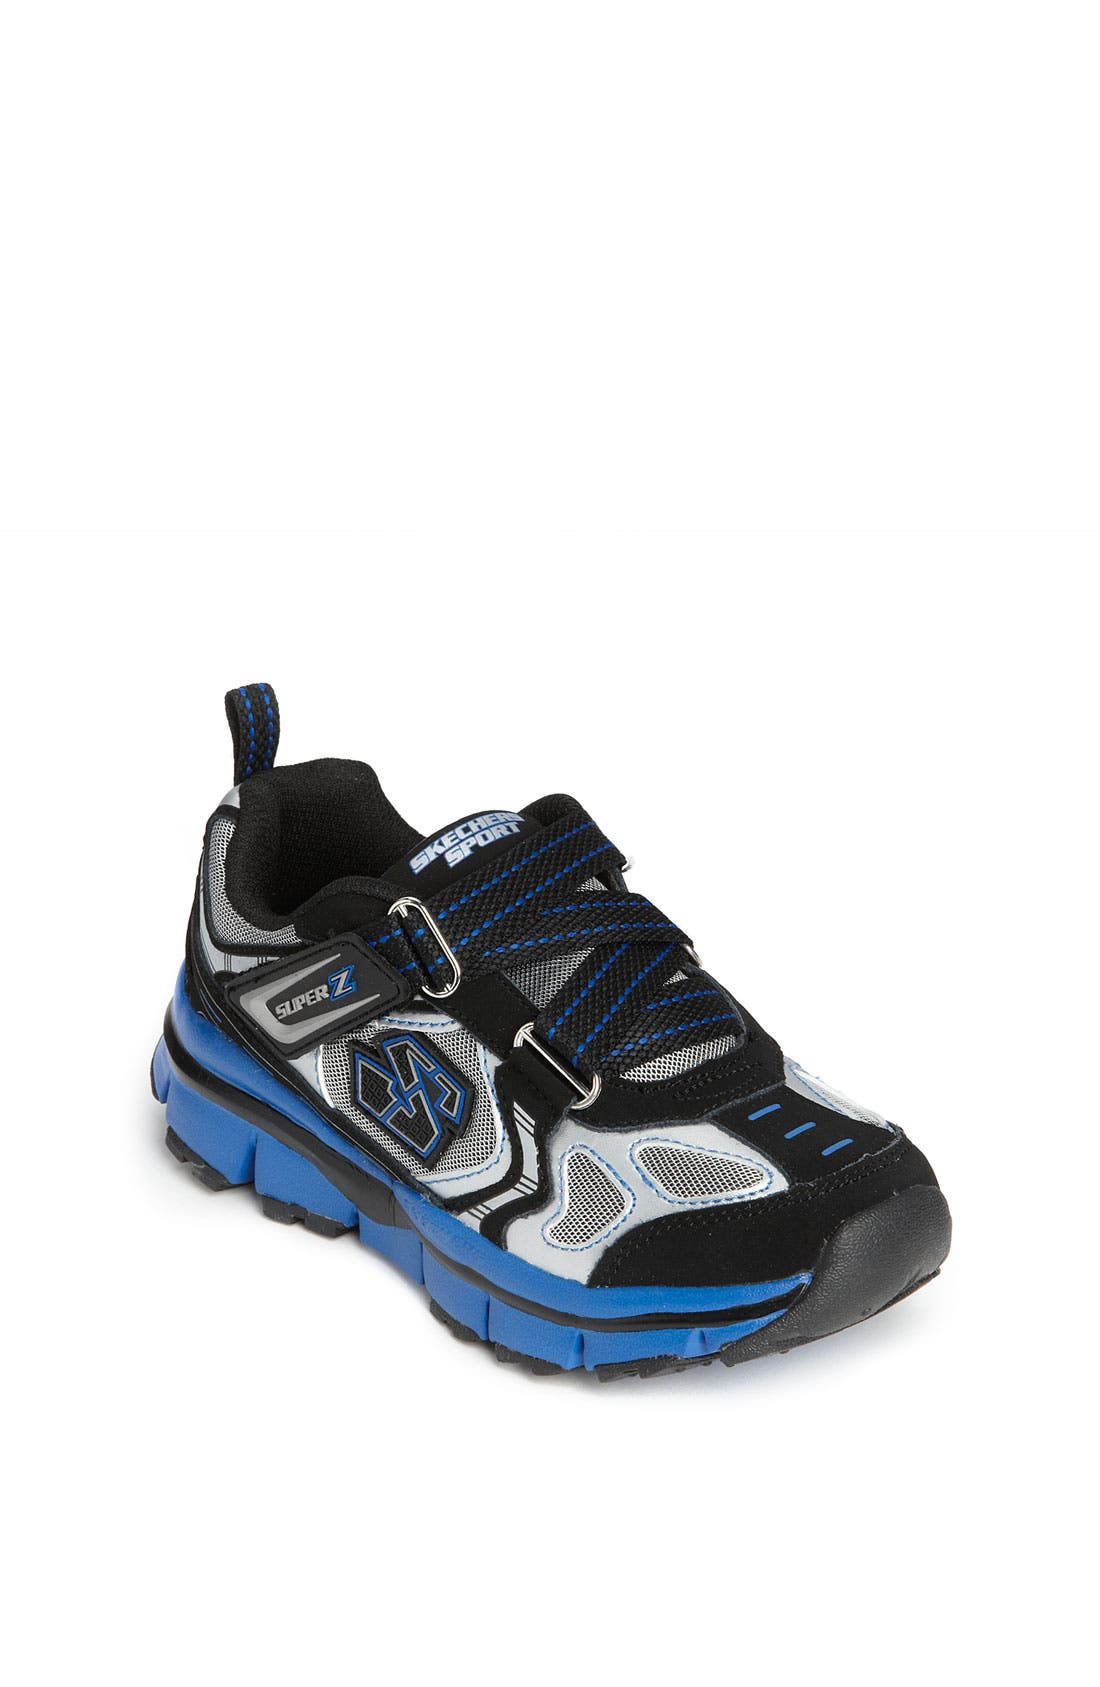 Alternate Image 1 Selected - SKECHERS 'Extreme Flex' Sneaker (Toddler, Little Kid & Big Kid)